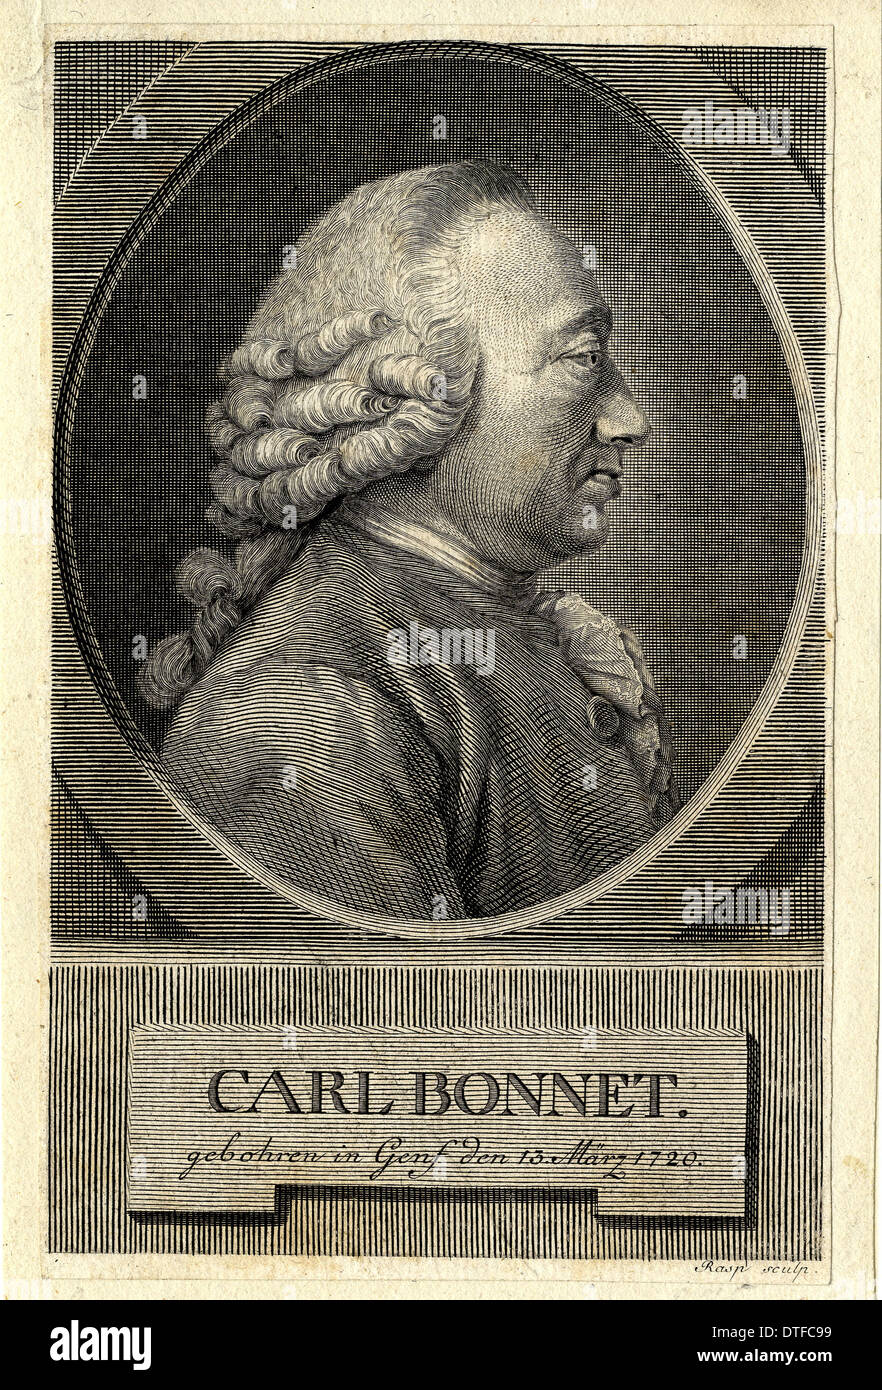 Carl Bonnet (1720-1793) - Stock Image